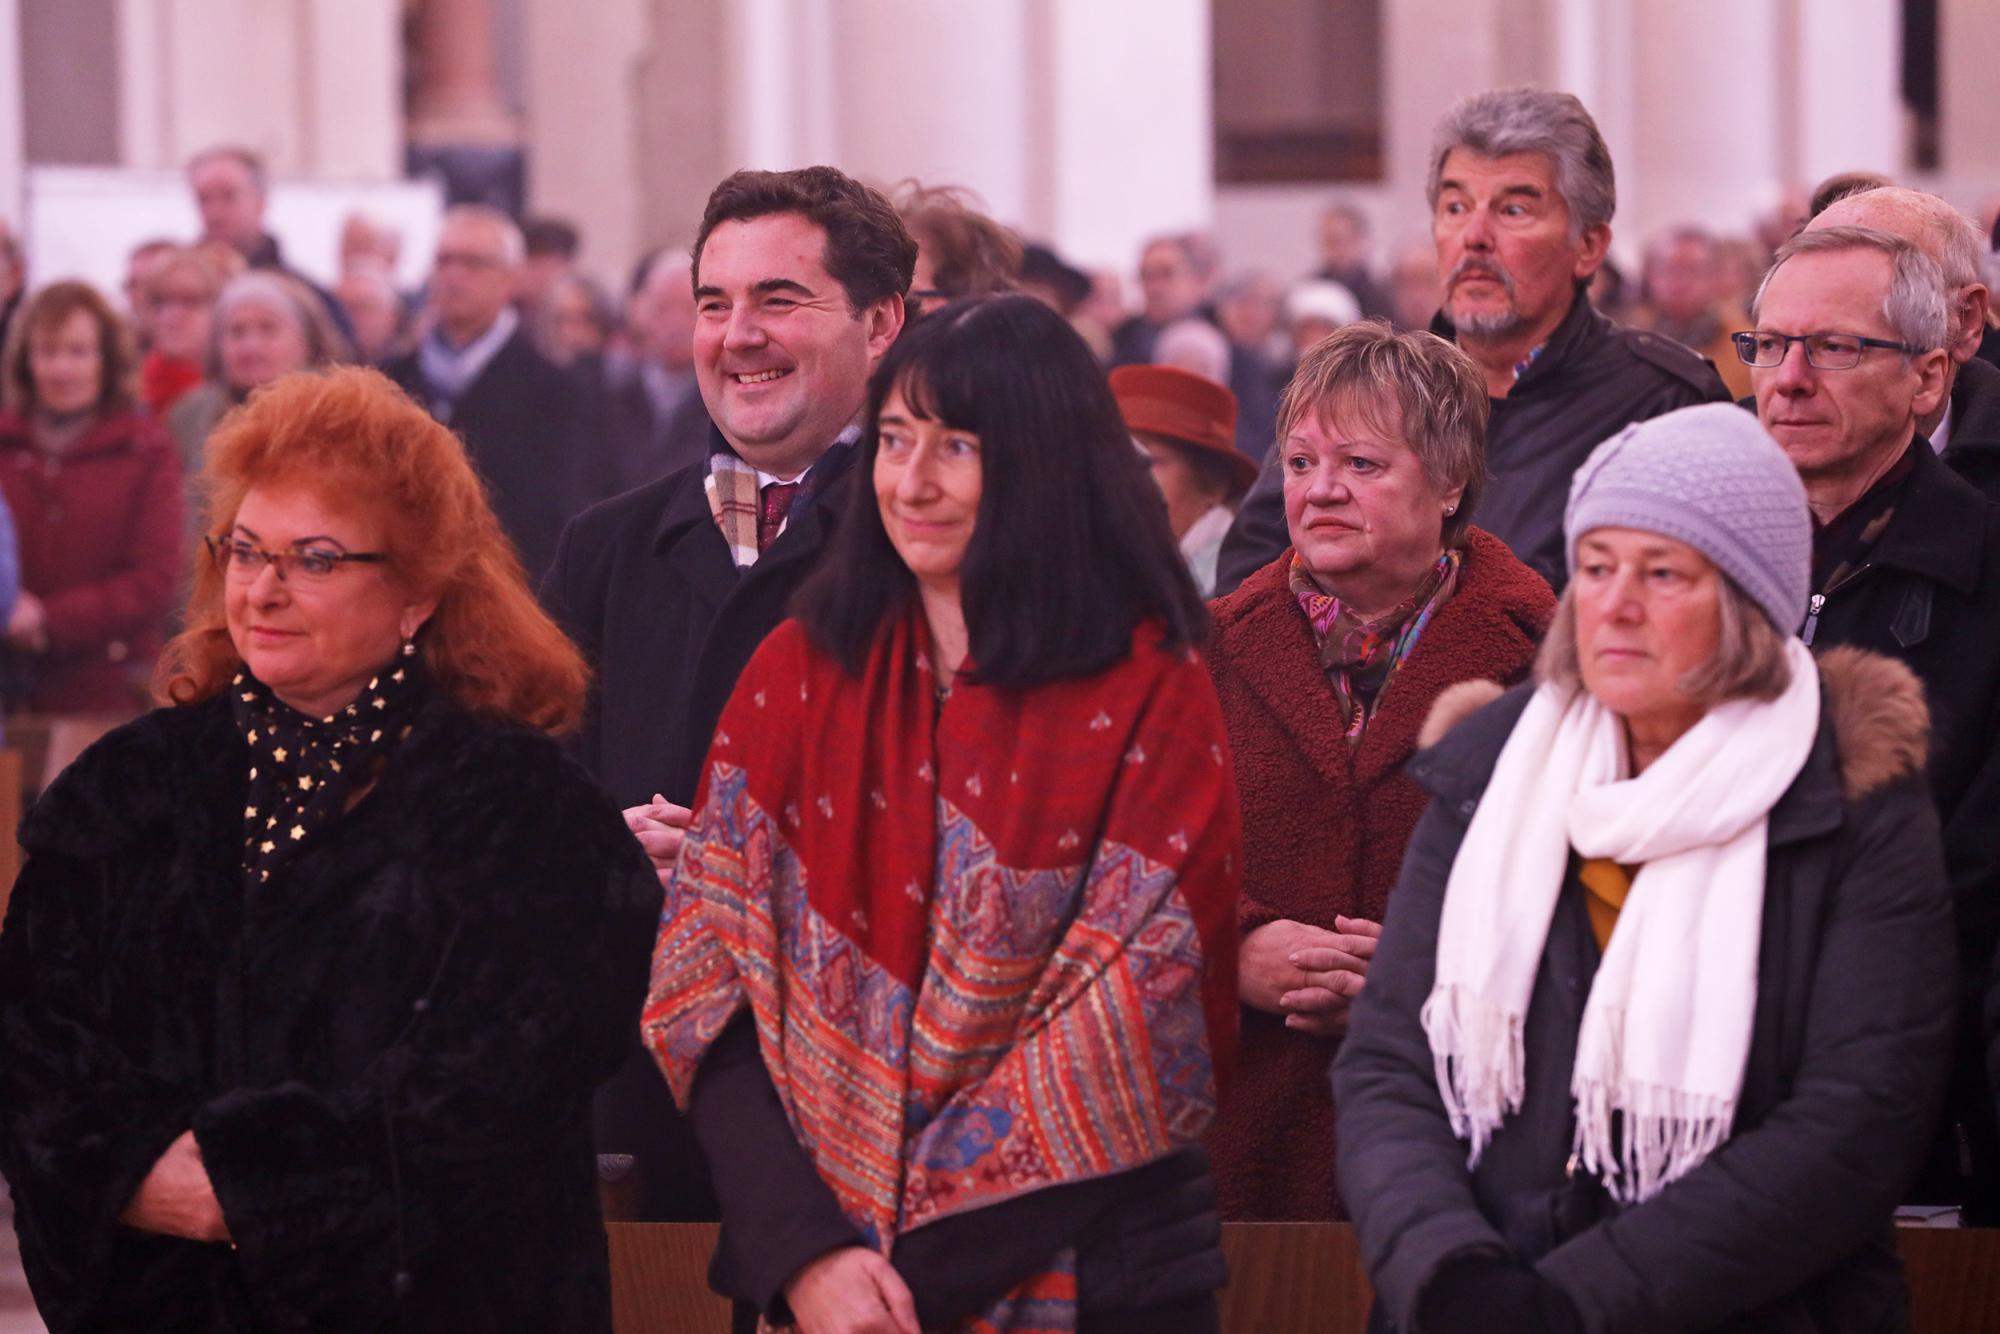 191201_Synodaler-Weg_Gottesdienst_4low